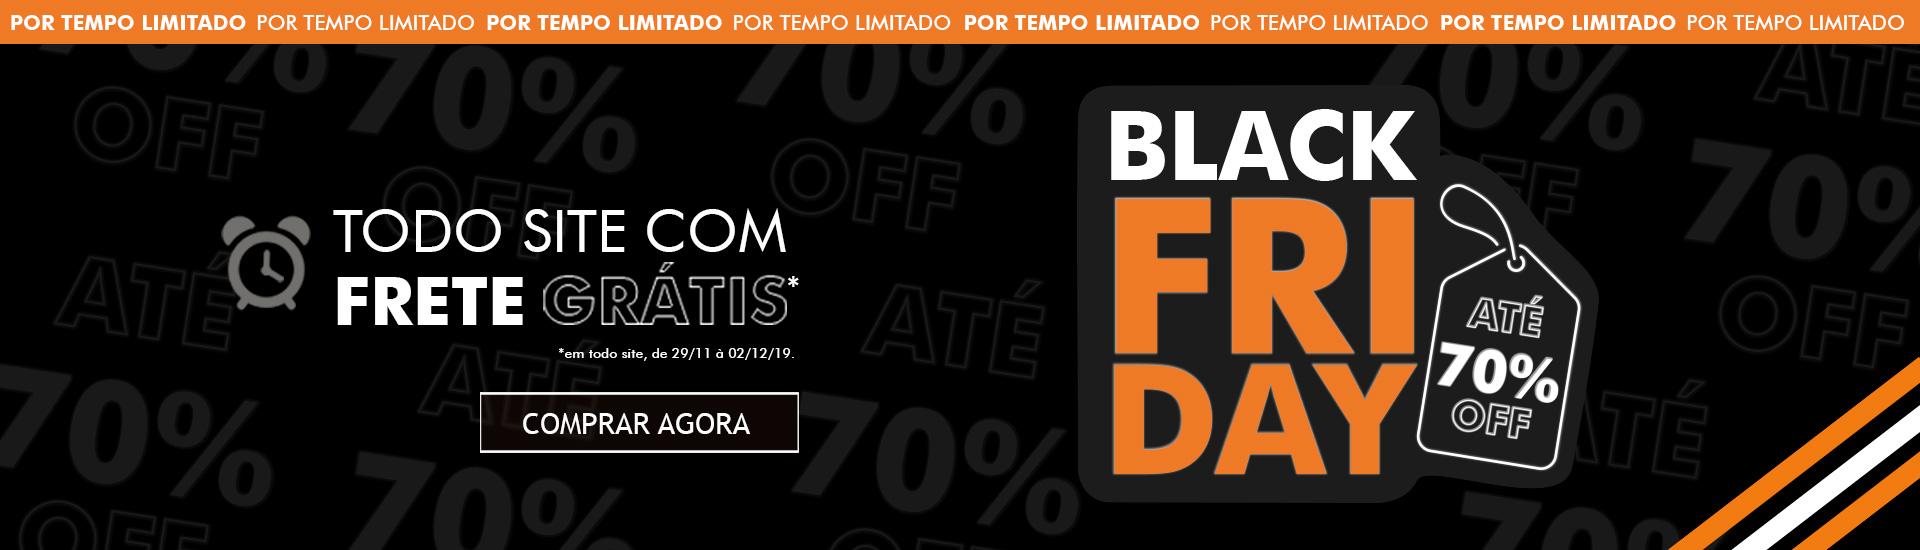 Black Friday + Frete Grátis*